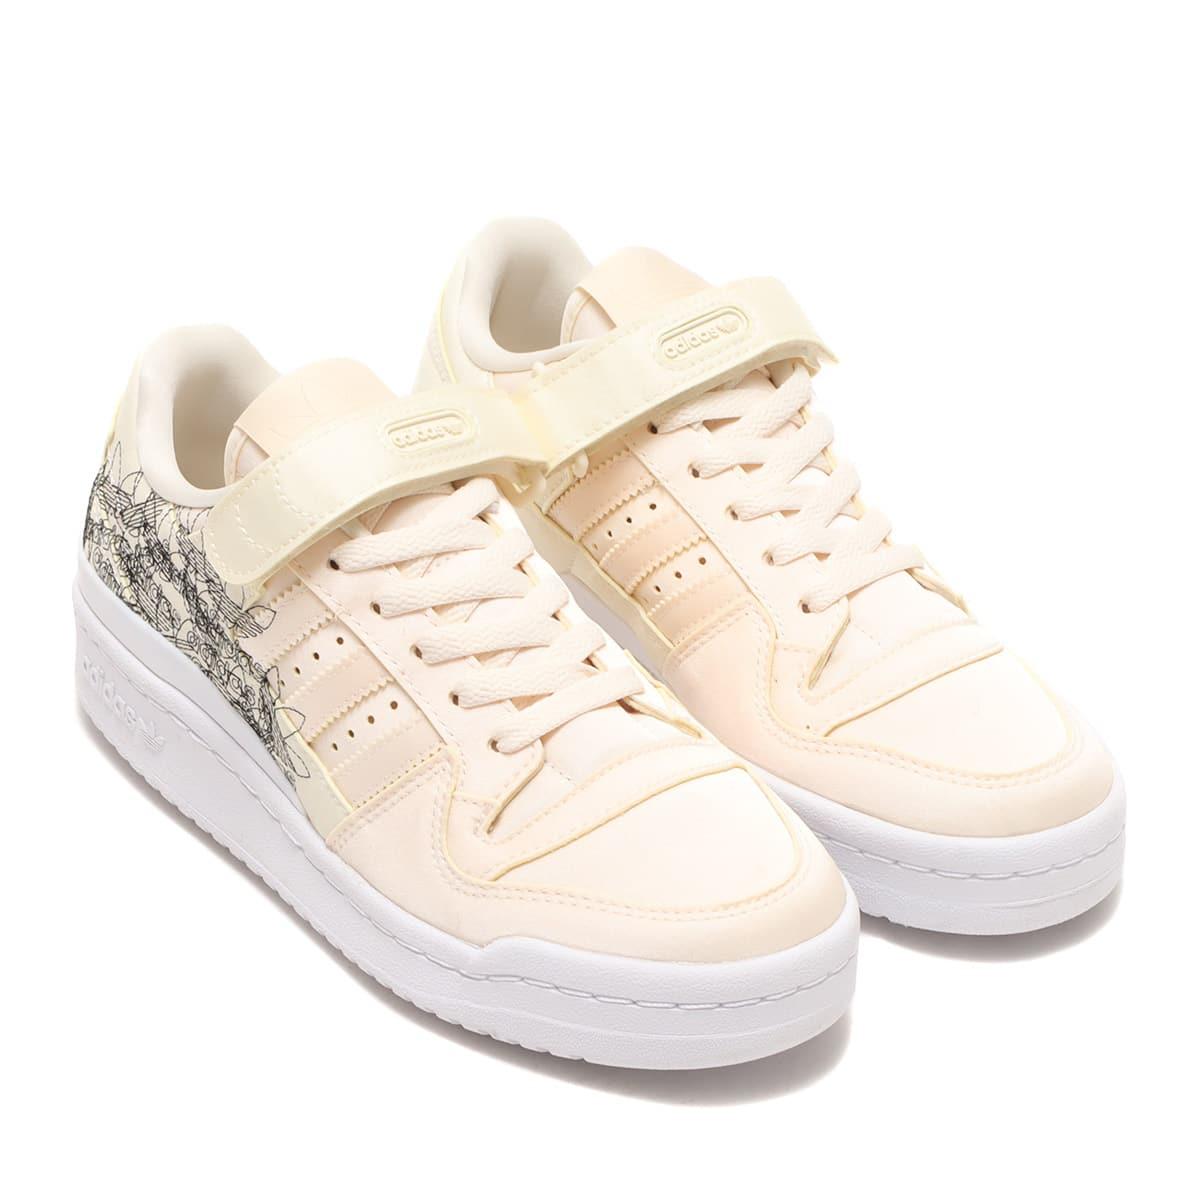 adidas FORUM 84 LOW W WONDER WHITE/CREAM WHITE/FOOTWEAR WHITE 21FW-I_photo_large